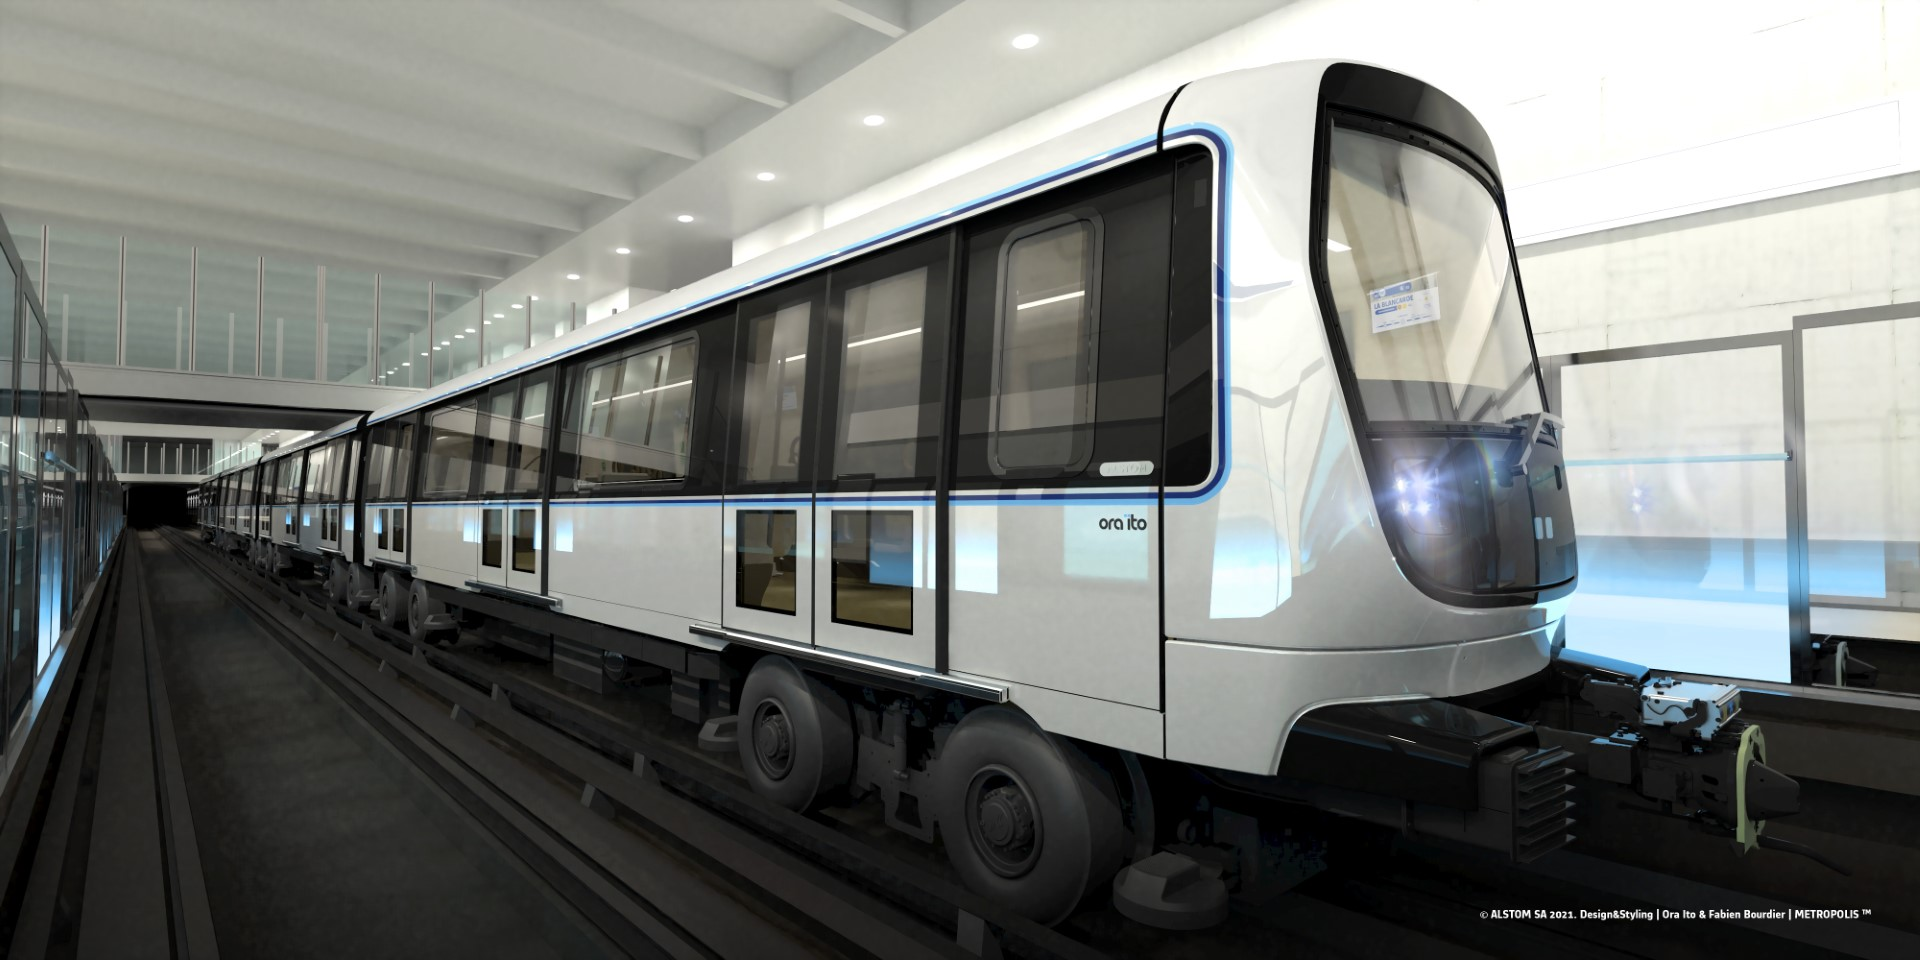 Alstom metro design for Marseille